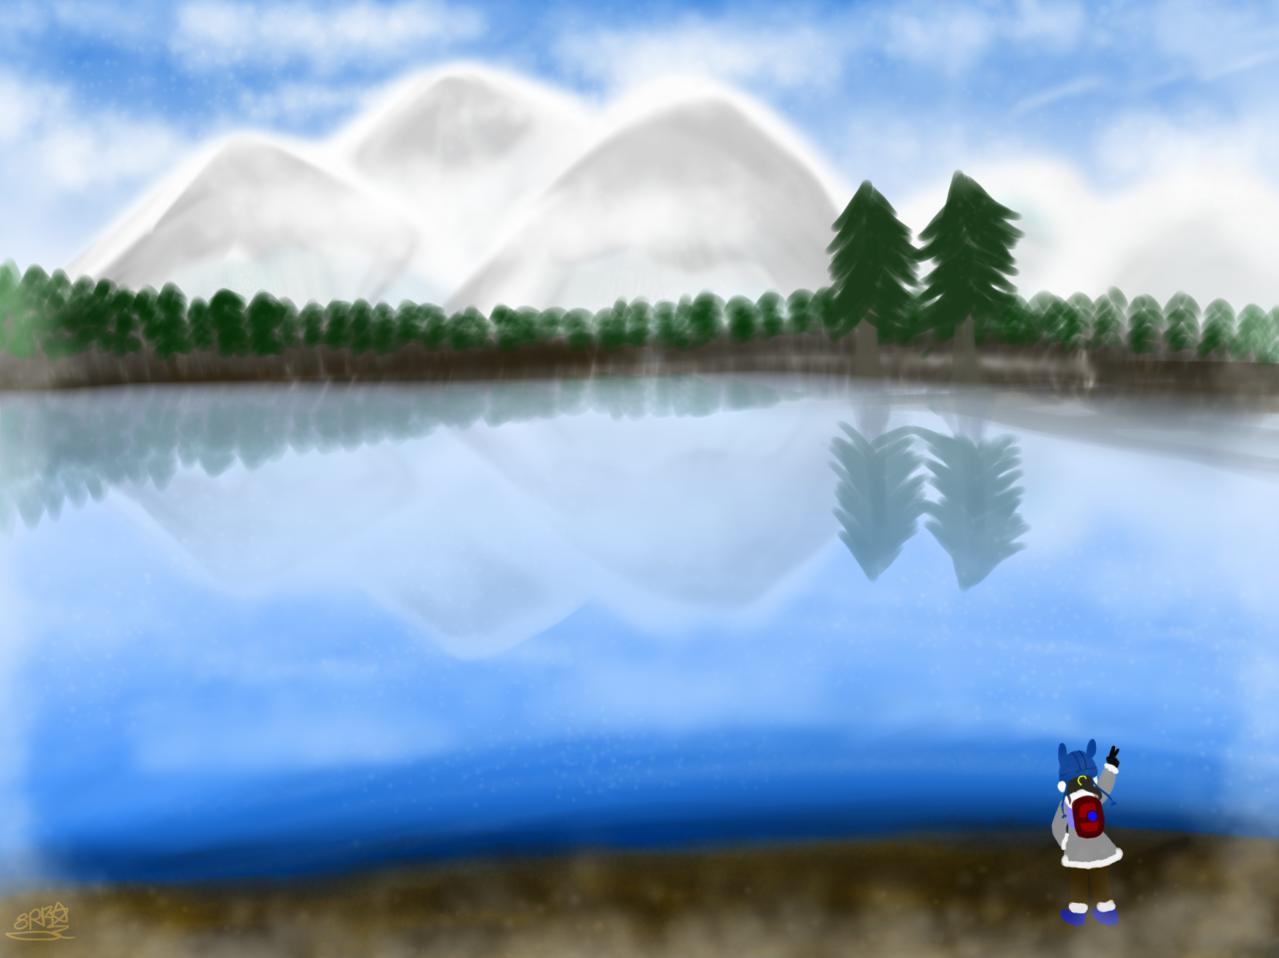 Little travel 小旅行 Illust of 神祕的星彩star sky 訓練人物 旅行 旅行插畫 特效blingbling background girl 訓練背景 旅行者 lake